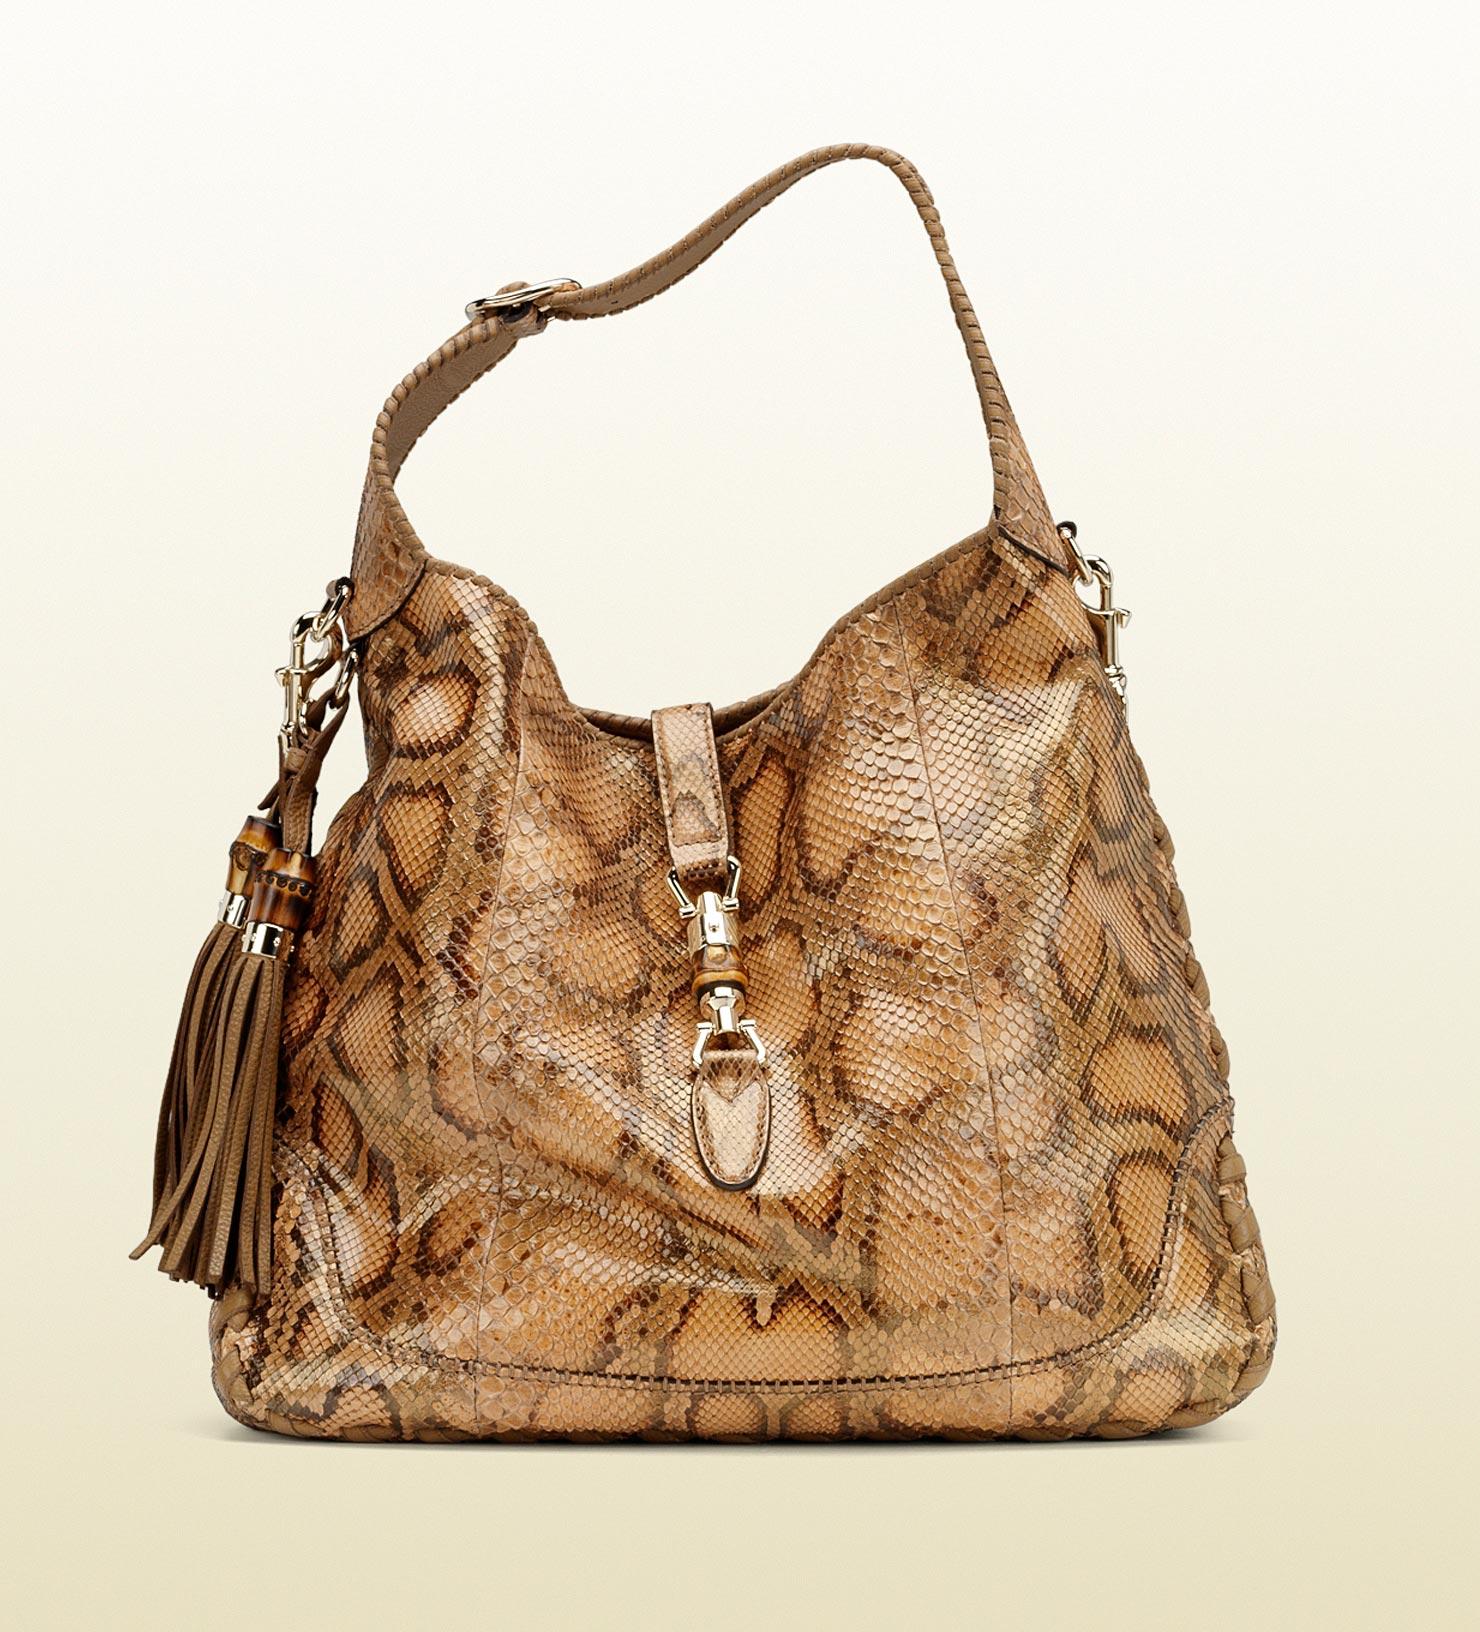 ab47ec75ce1c Lyst - Gucci New Jackie Python Shoulder Bag